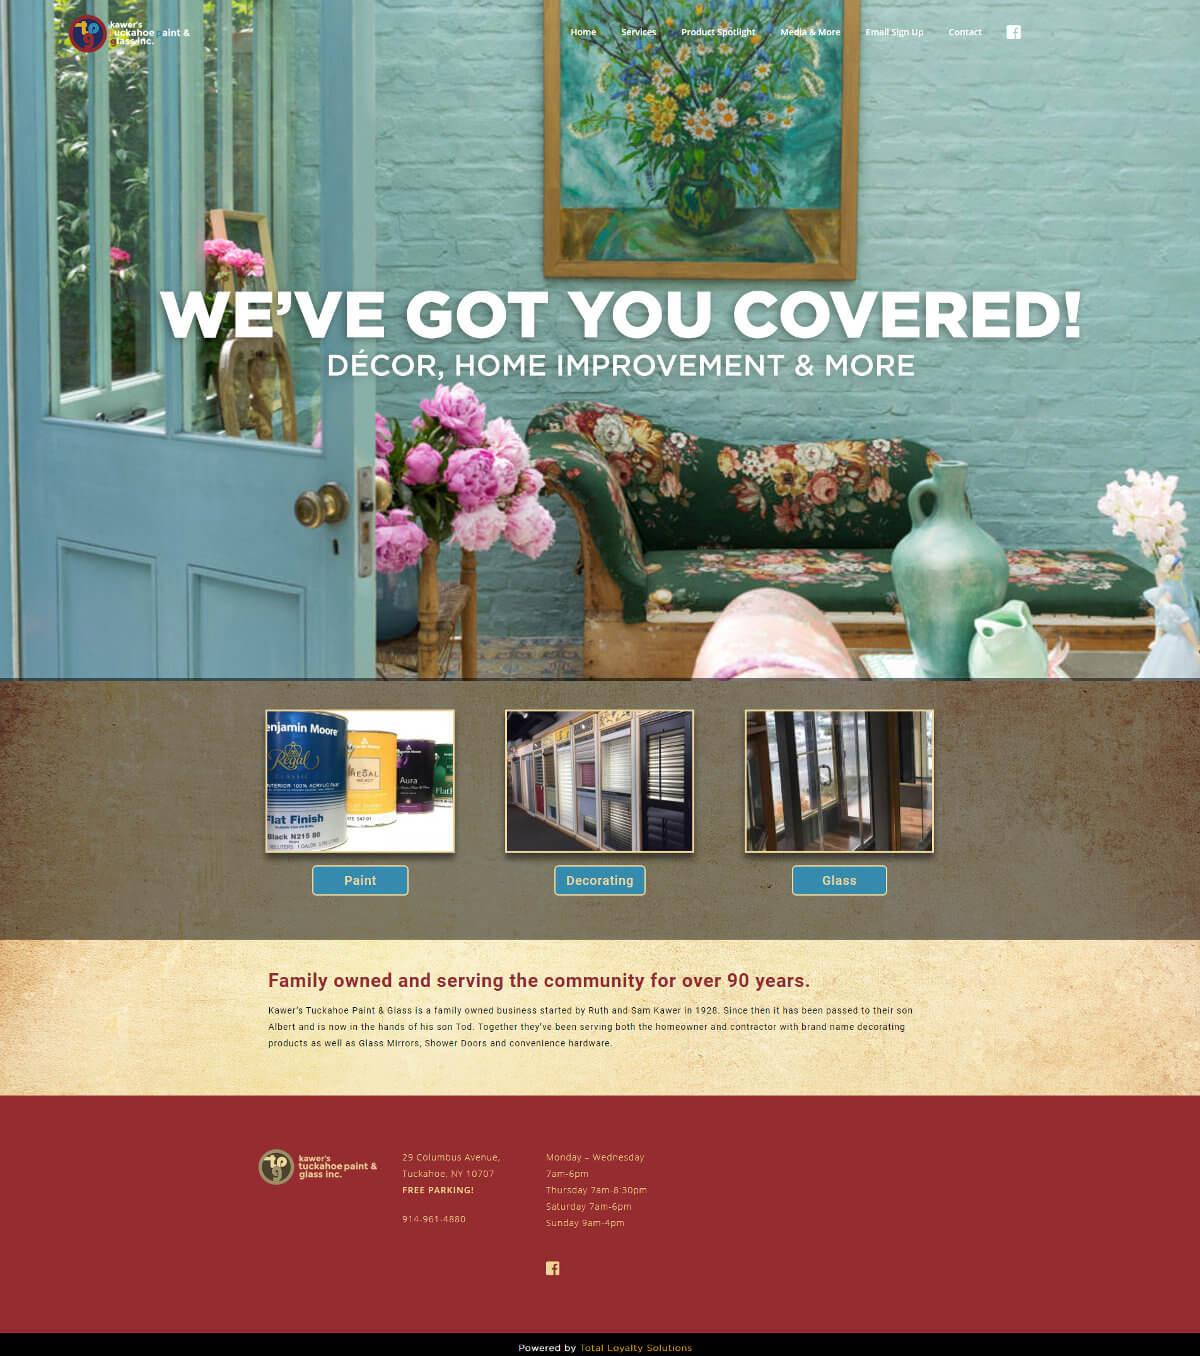 Kawer's Tuckahoe Paint & Glass, Inc. - TLS Mobile Friendly Website